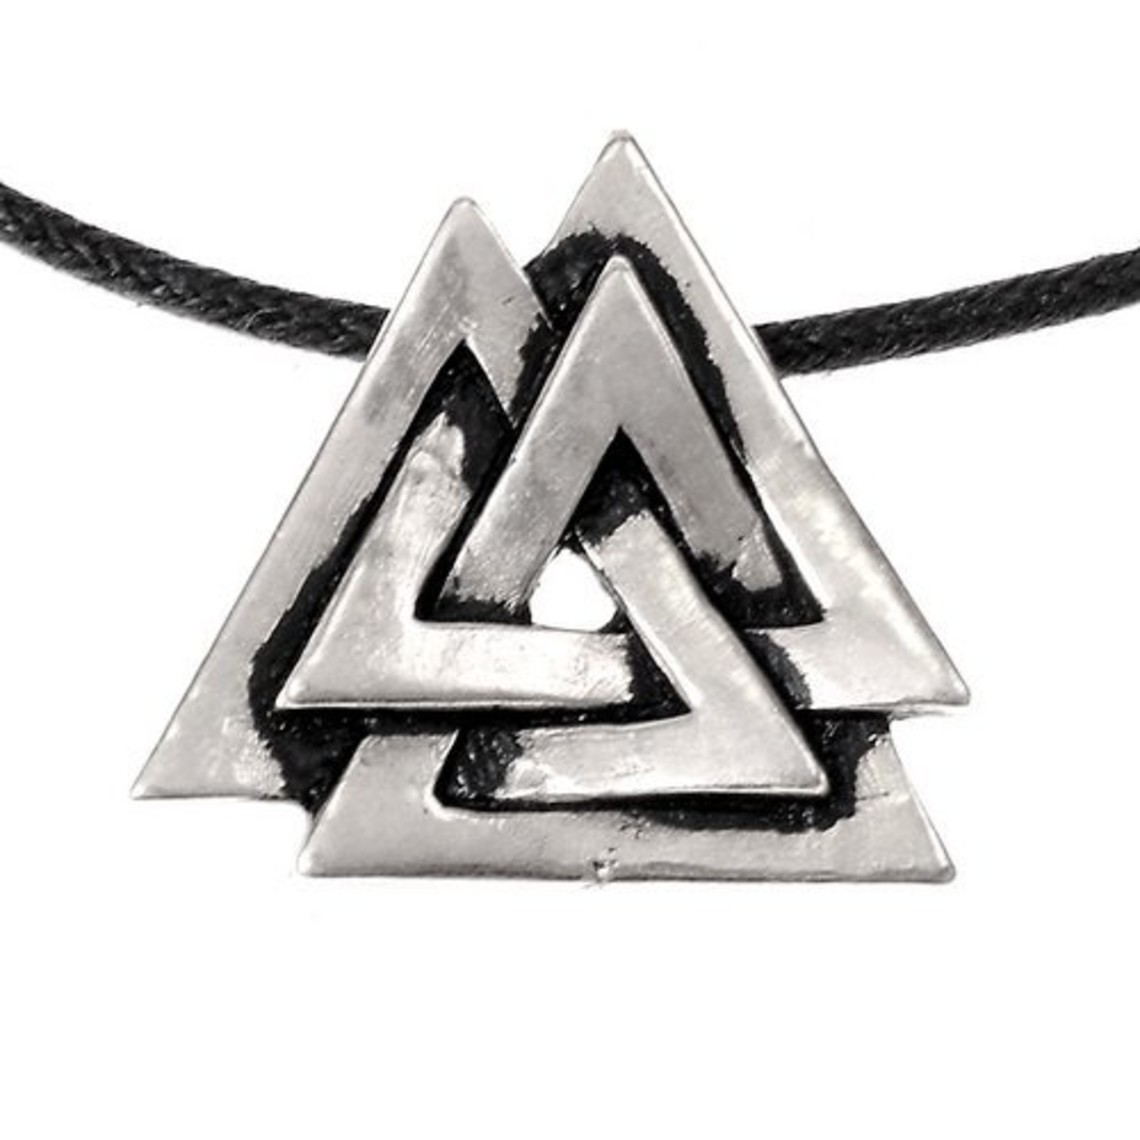 Valknut amulet, verzilverd